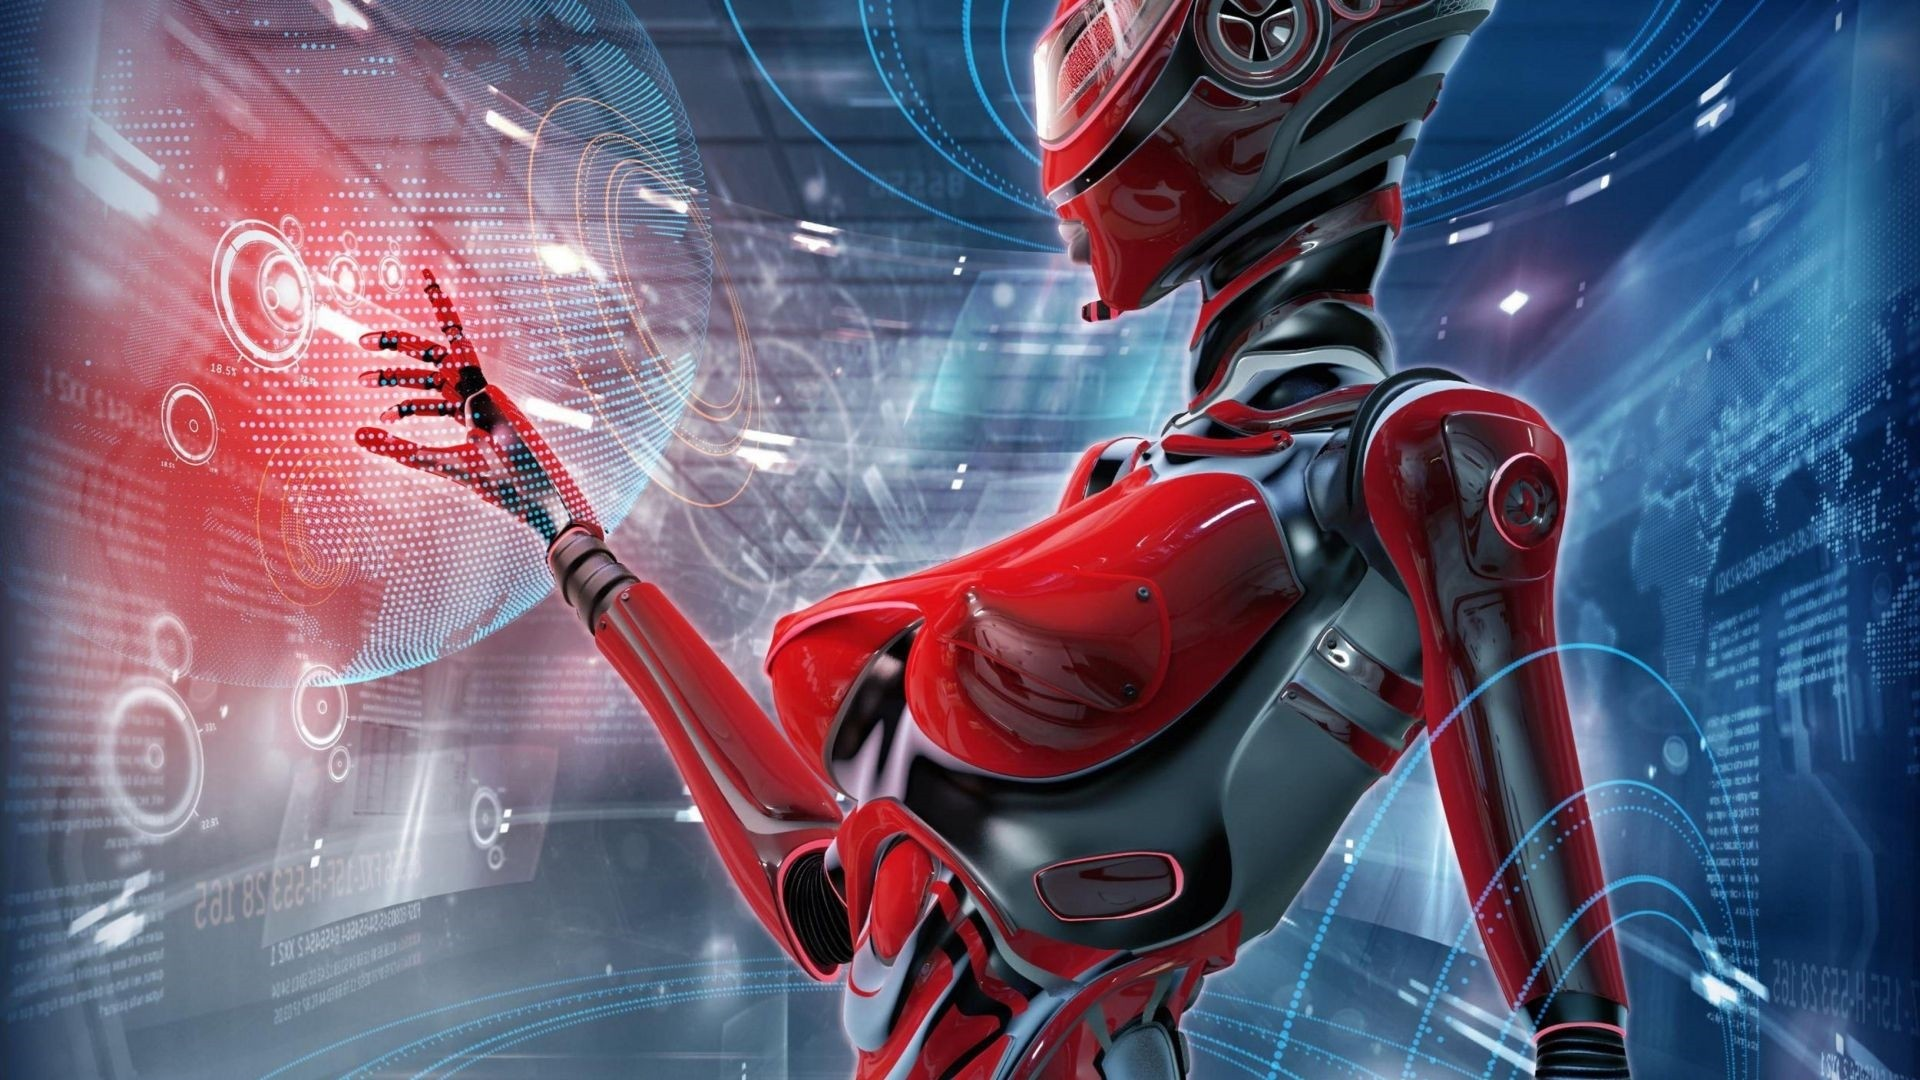 Cyborg Wallpaper Image